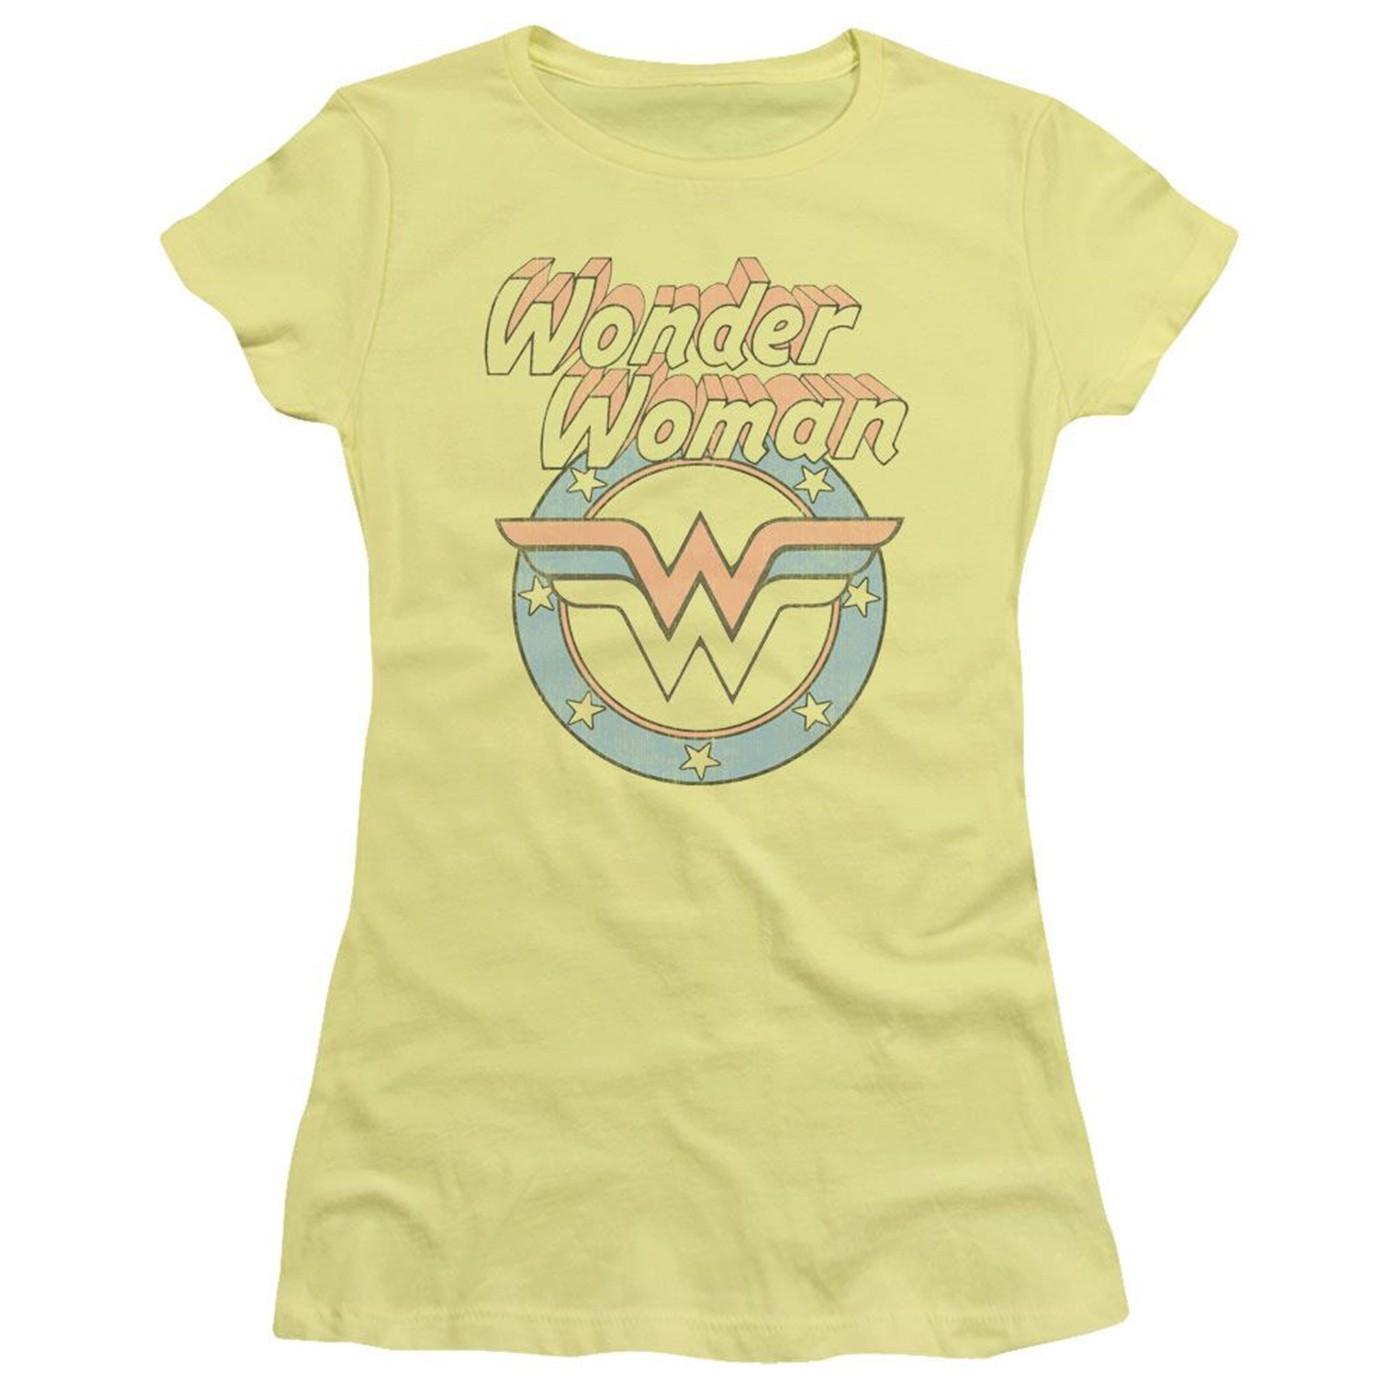 Wonder Woman Vintage Logo Women's Yellow T-Shirt